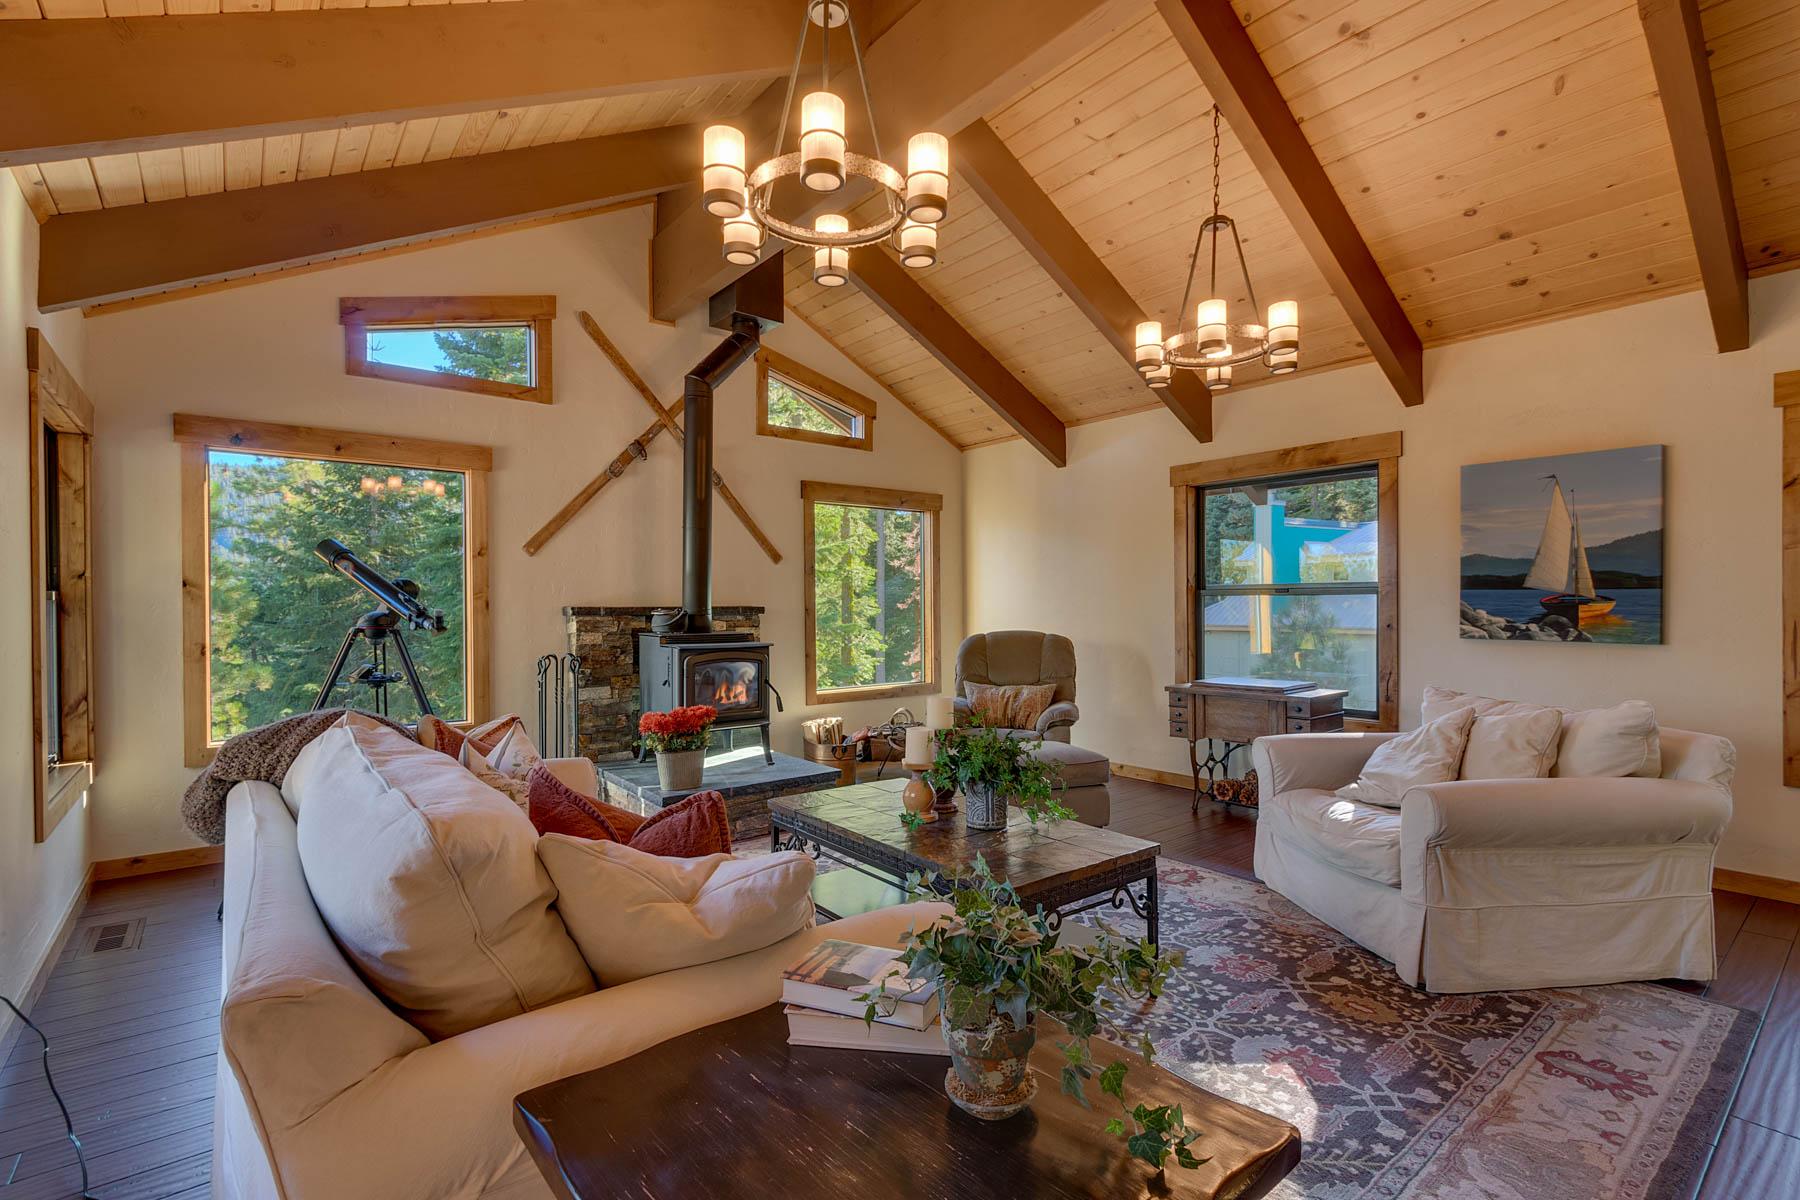 Additional photo for property listing at 4035 Zermatt Road, Tahoe City, Ca 96145 4035 Zermatt Road Tahoe City, California 96145 Estados Unidos